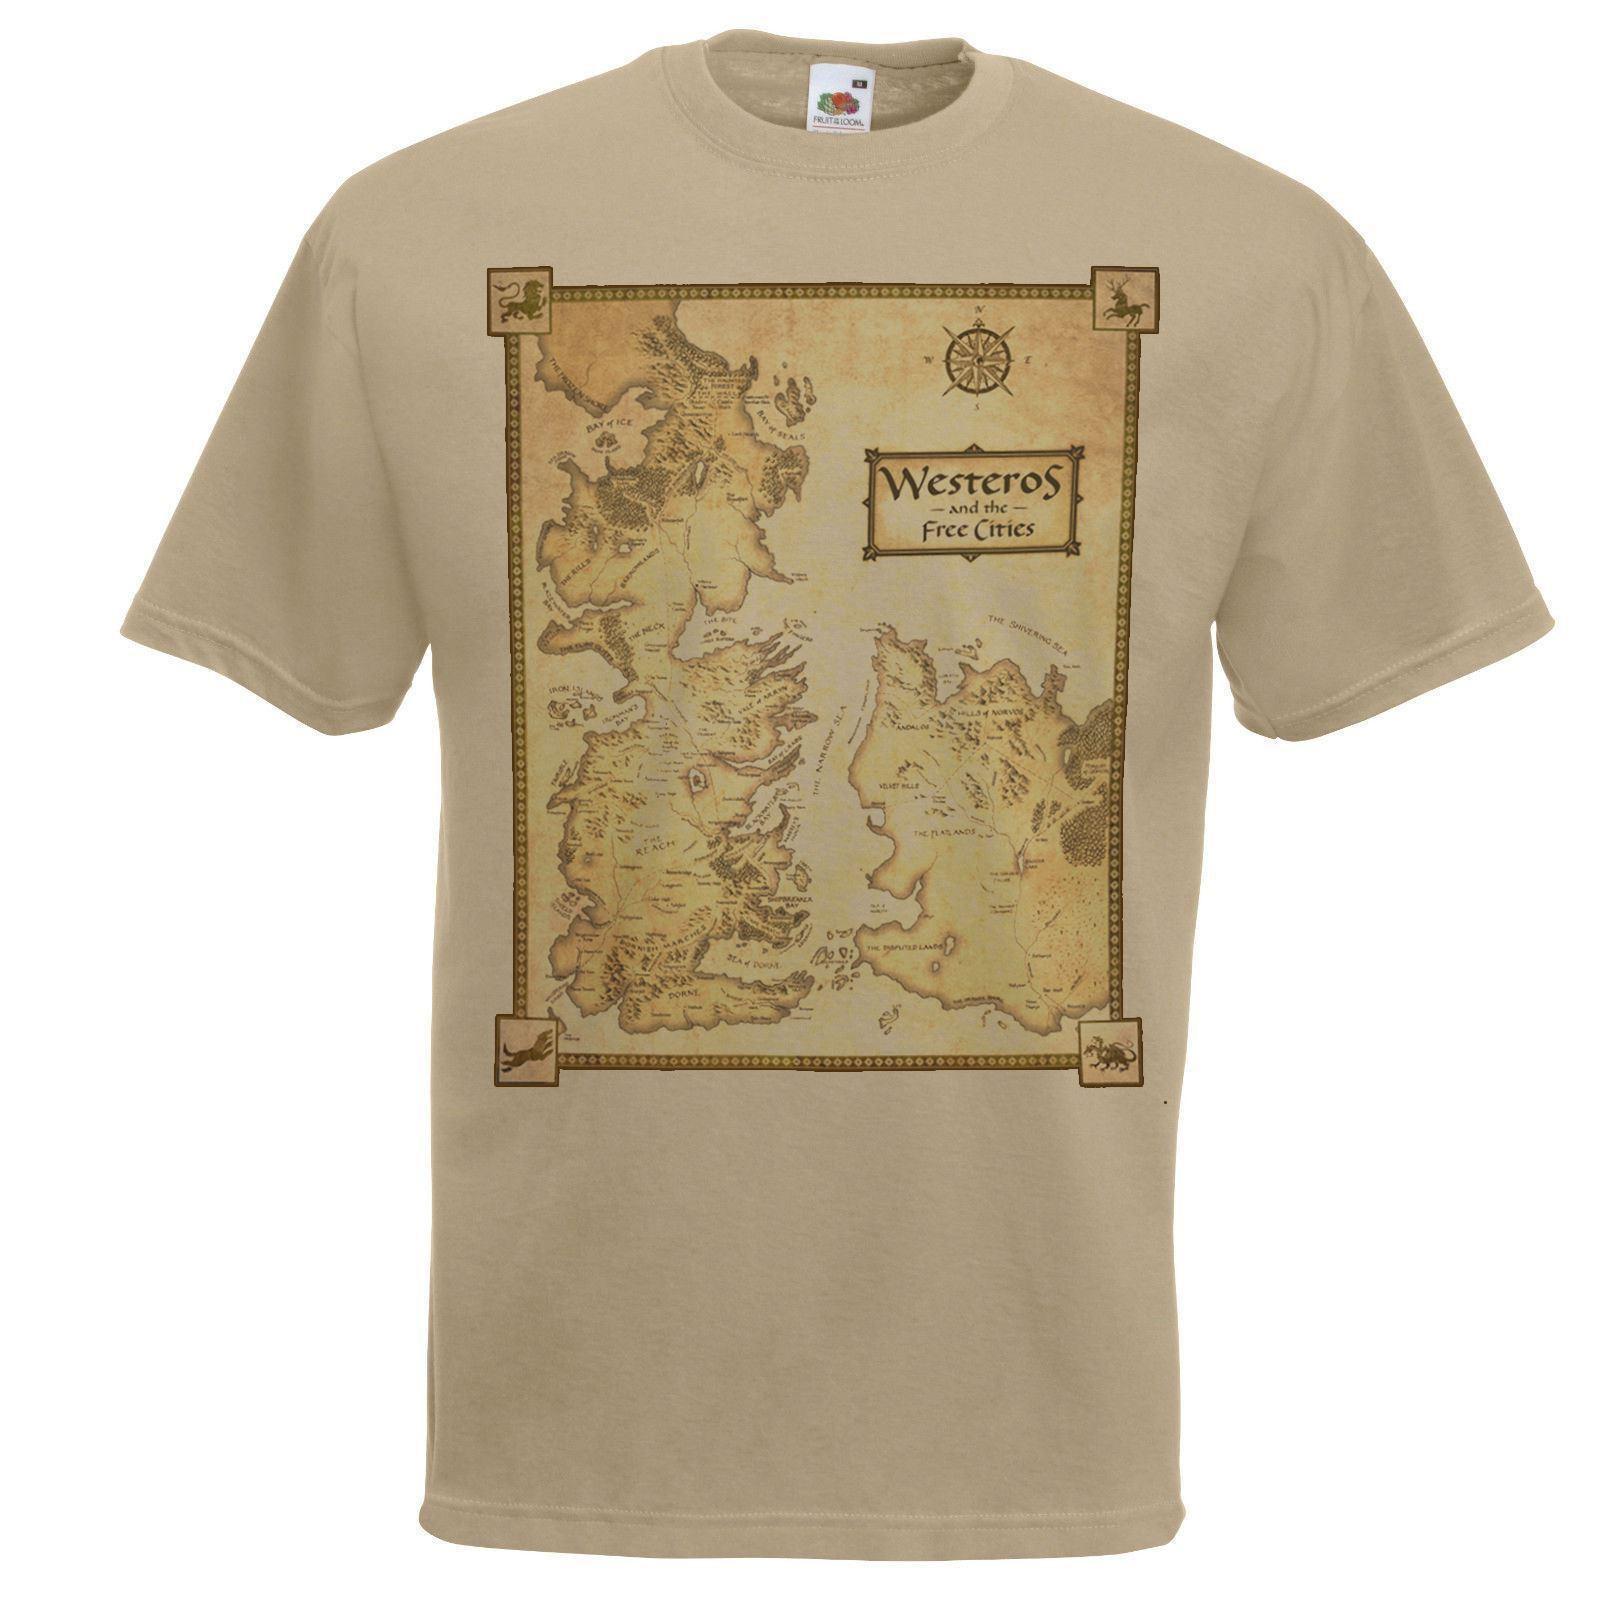 Mens Khaki Westeros Map T-Shirt Game of Thrones Geography T Shirt Funny on game of thrones pokemon shirt, game of thrones stark shirt, game of thrones school shirt, united states map shirt, africa map shirt, game of thrones beer bottles, fargo map shirt, game of thrones table book, westeros map shirt,